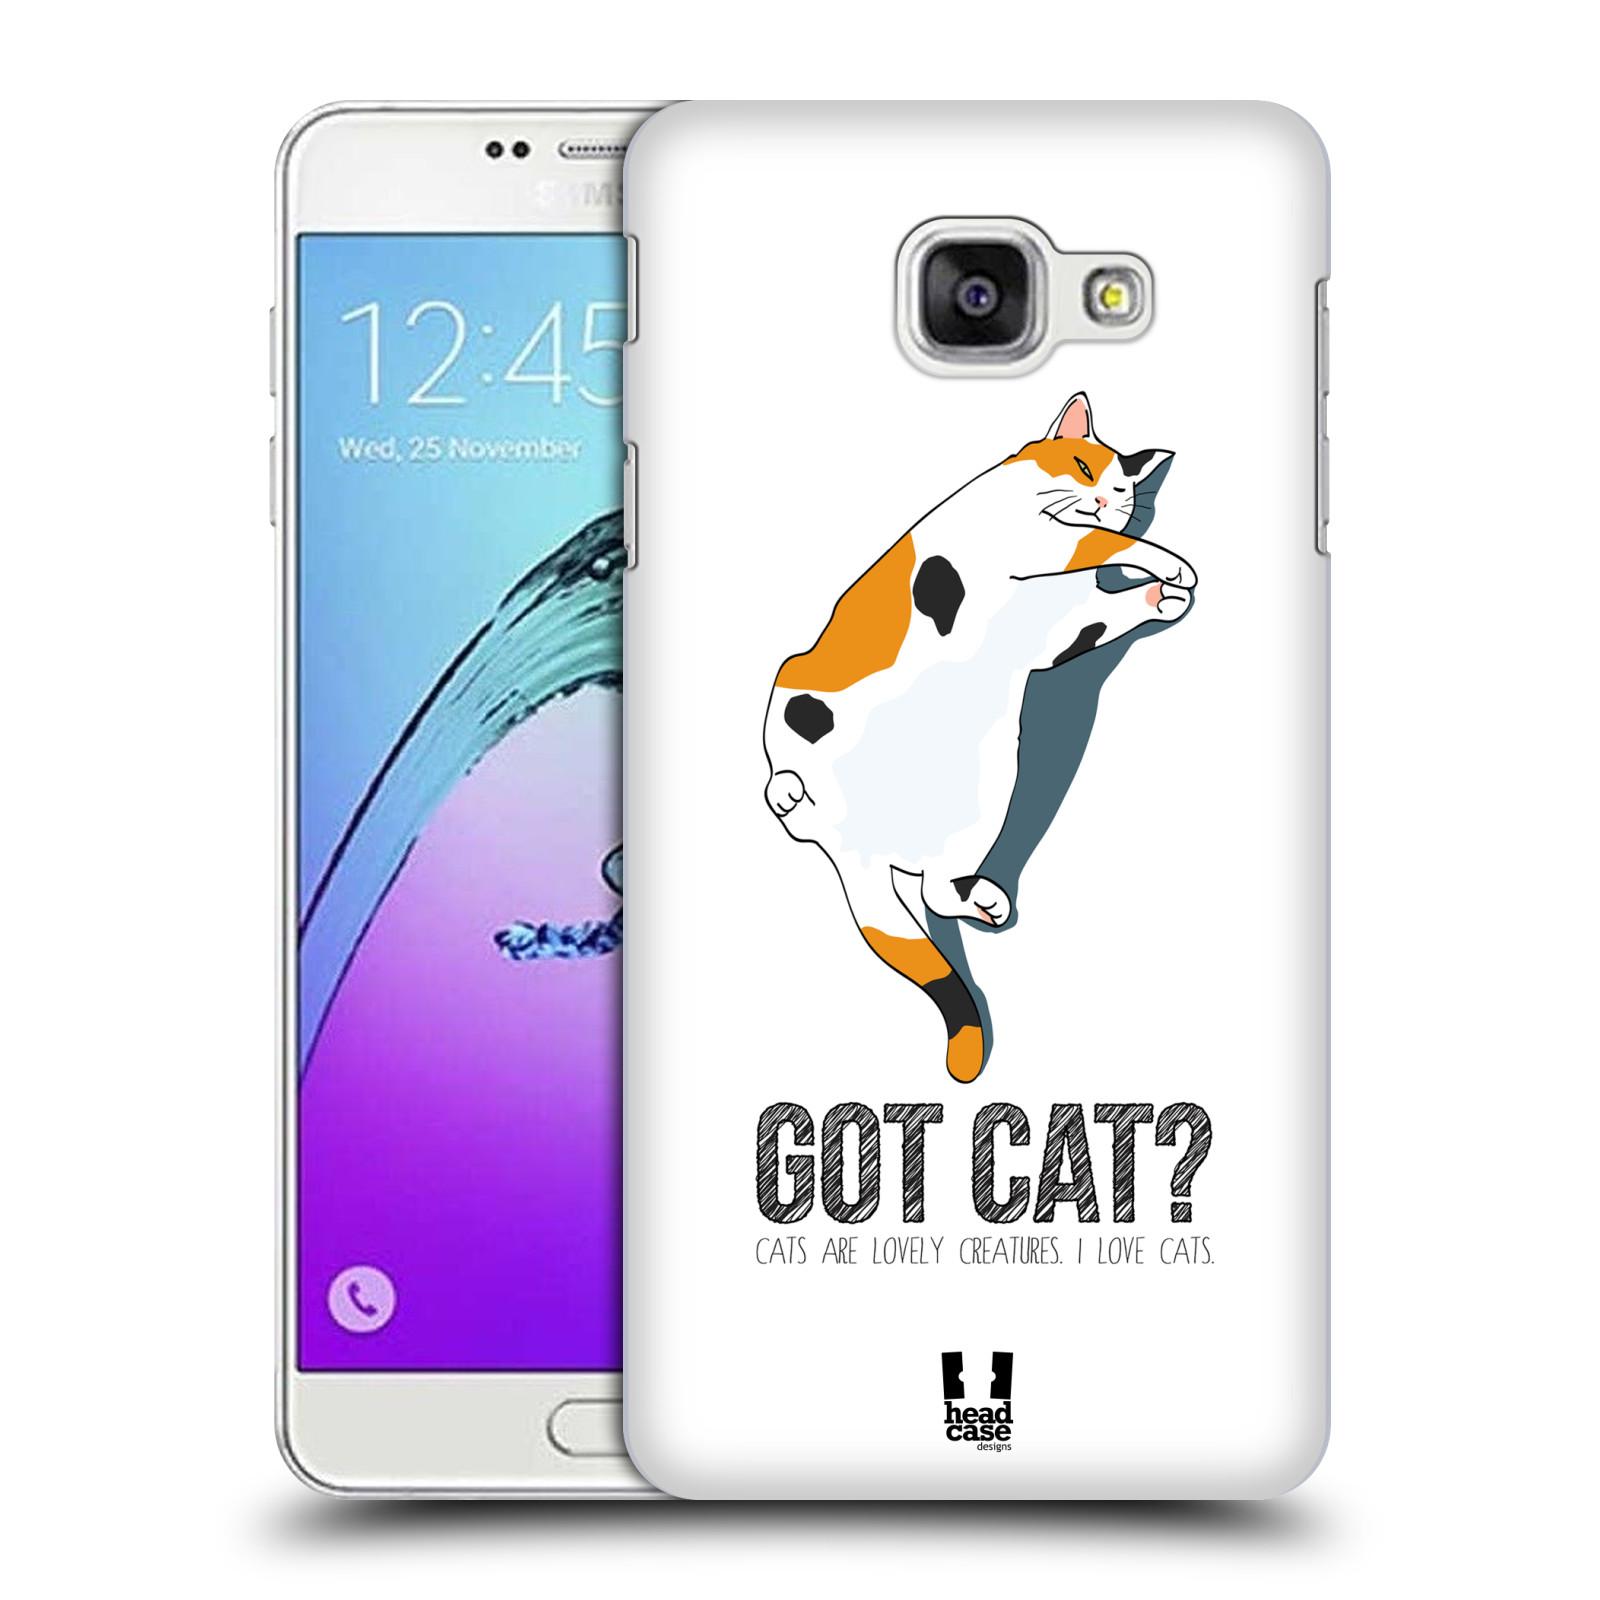 HEAD-CASE-DESIGNS-GOT-CAT-HARD-BACK-CASE-FOR-SAMSUNG-GALAXY-A7-2017